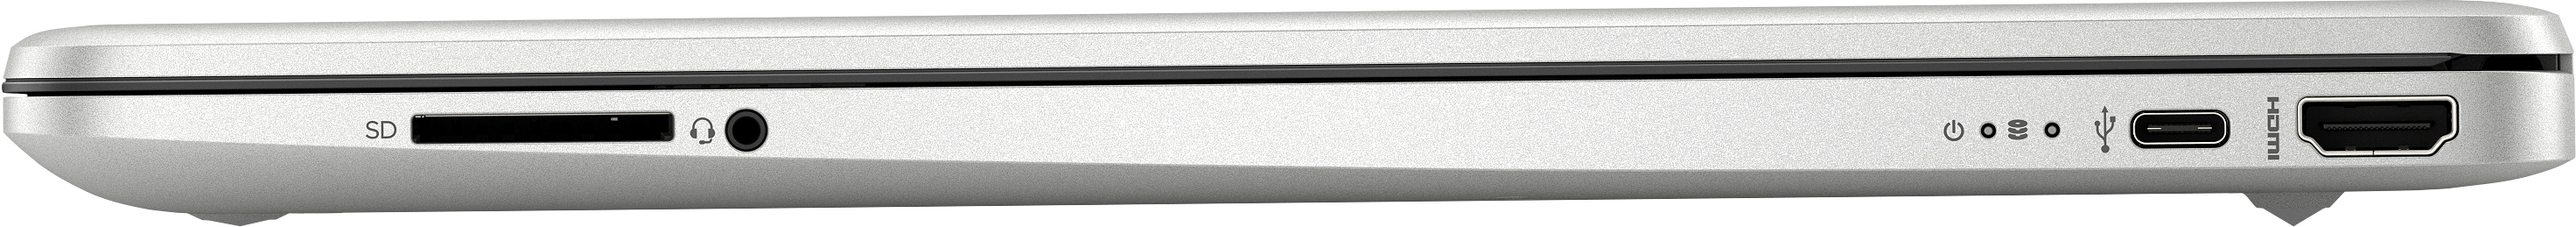 "15s-eq2032nb (15,6"" Full HD AG IPS, AMD Ryzen 5-5500U, 16 GB DDR4, 1000 GB SSD, Windows 10, zilver)"